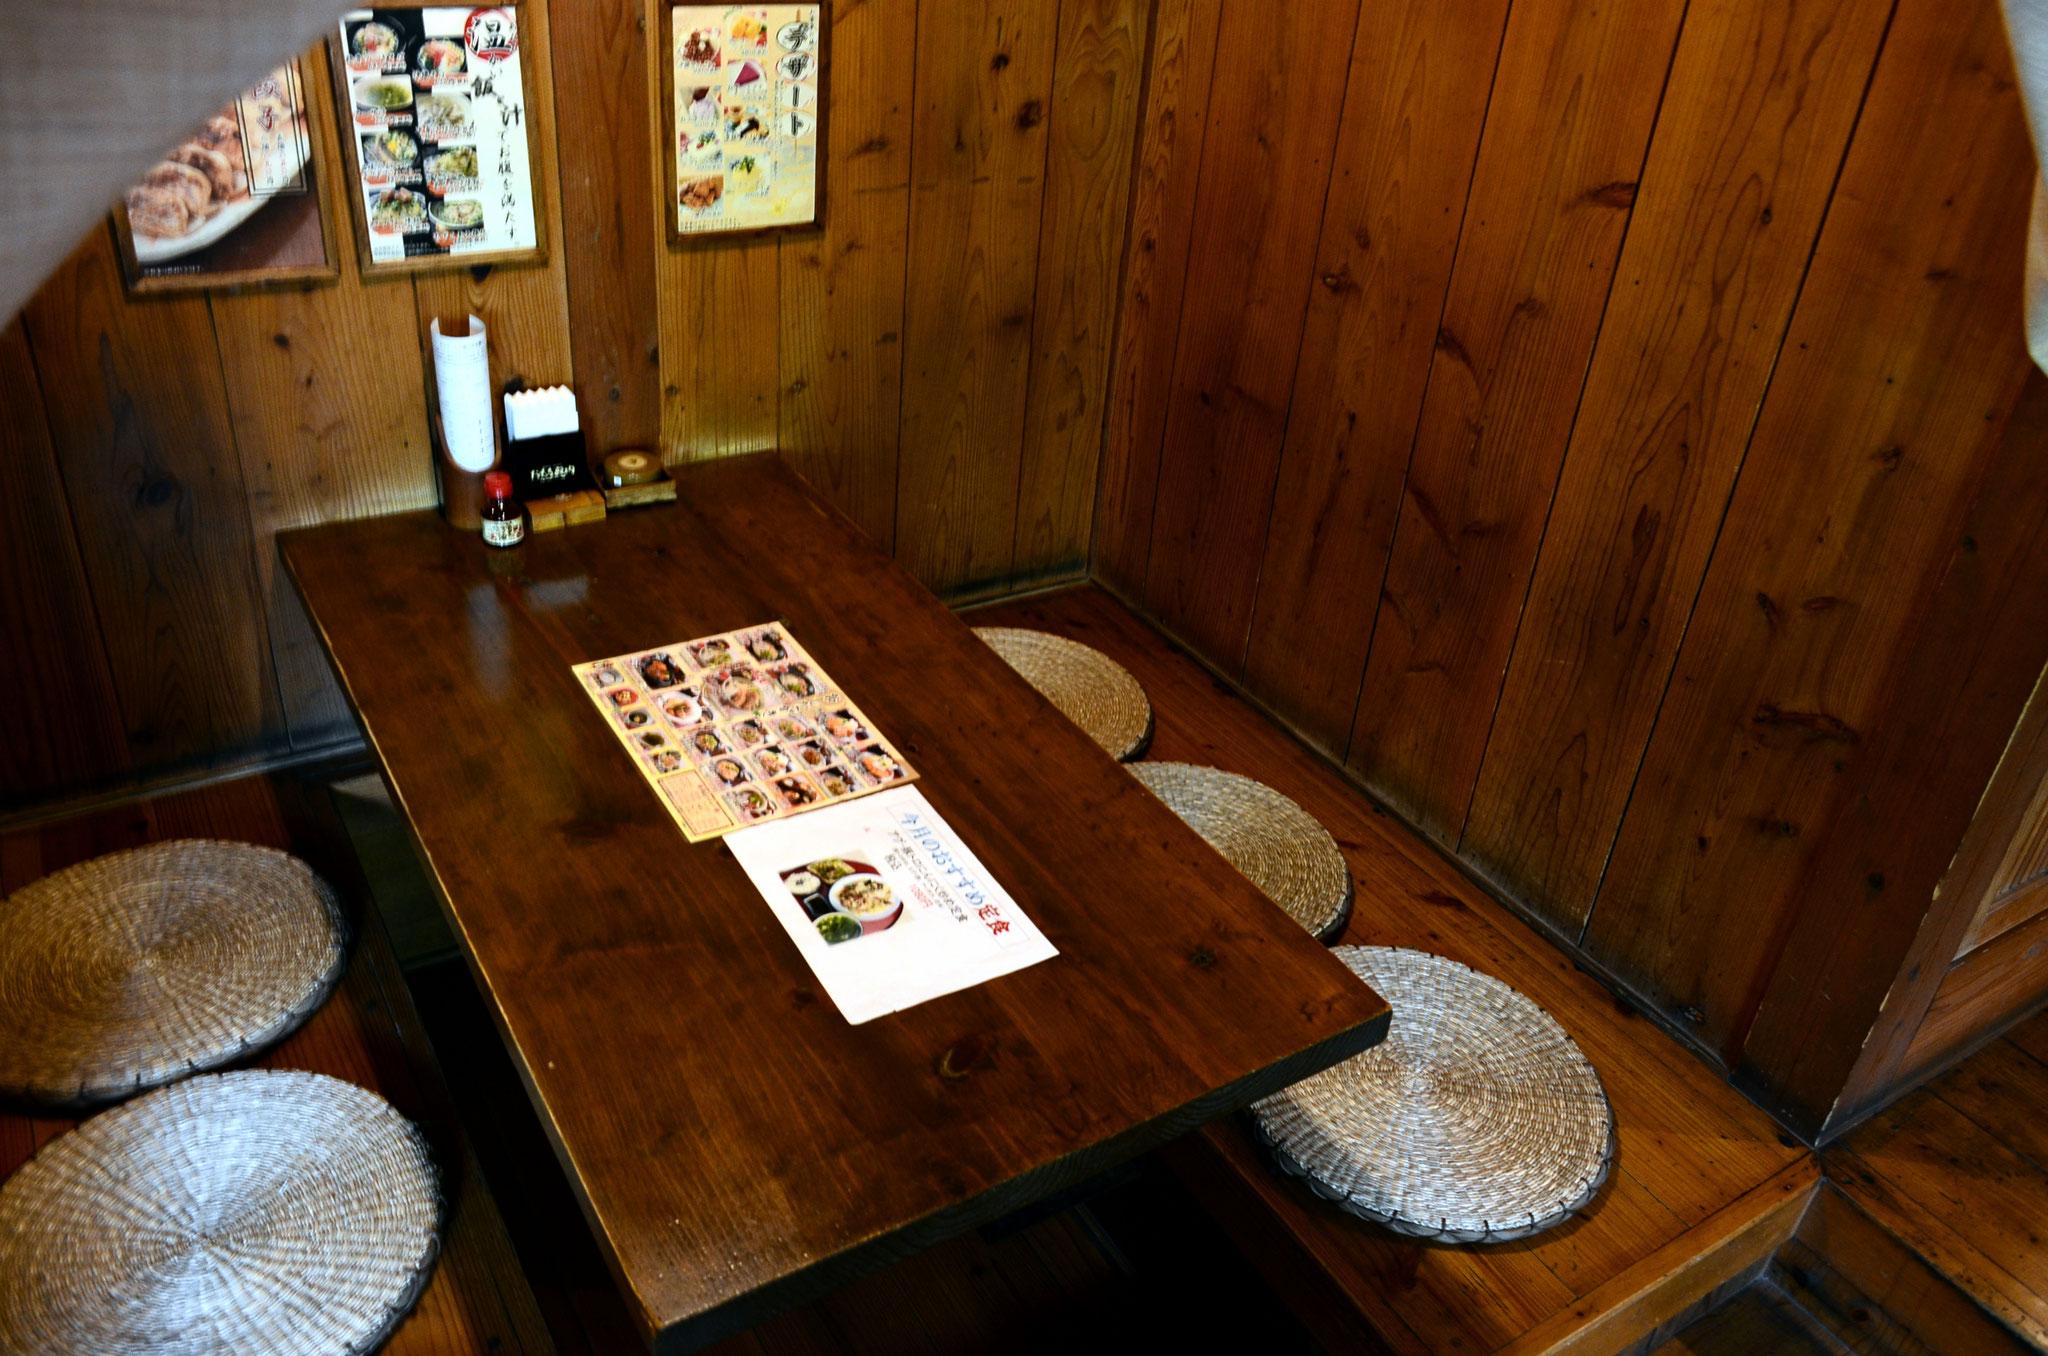 Karate Geschichtstour – Sitzgelegenheiten beim Essen